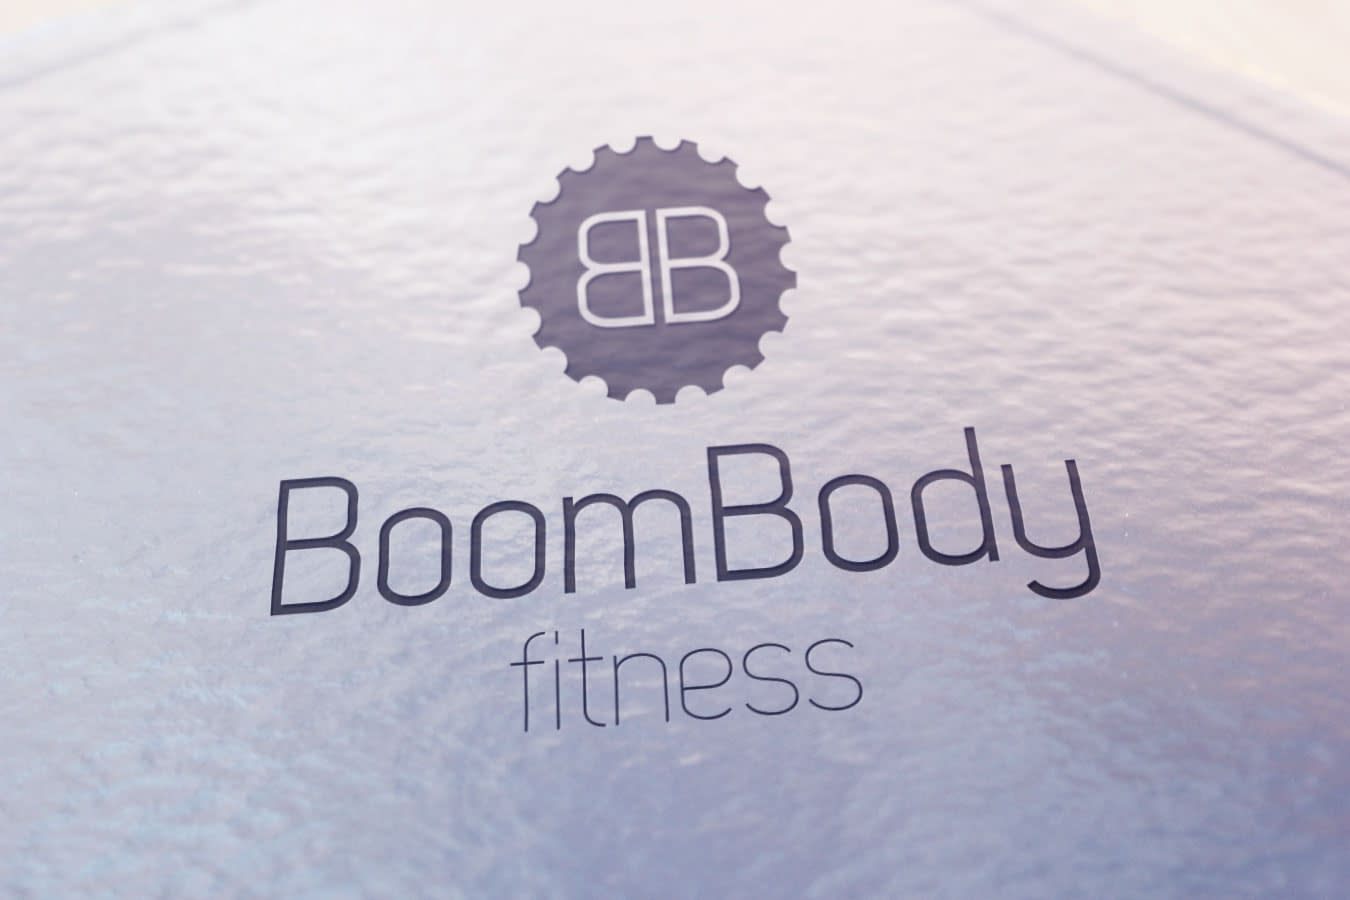 logos_boombody3